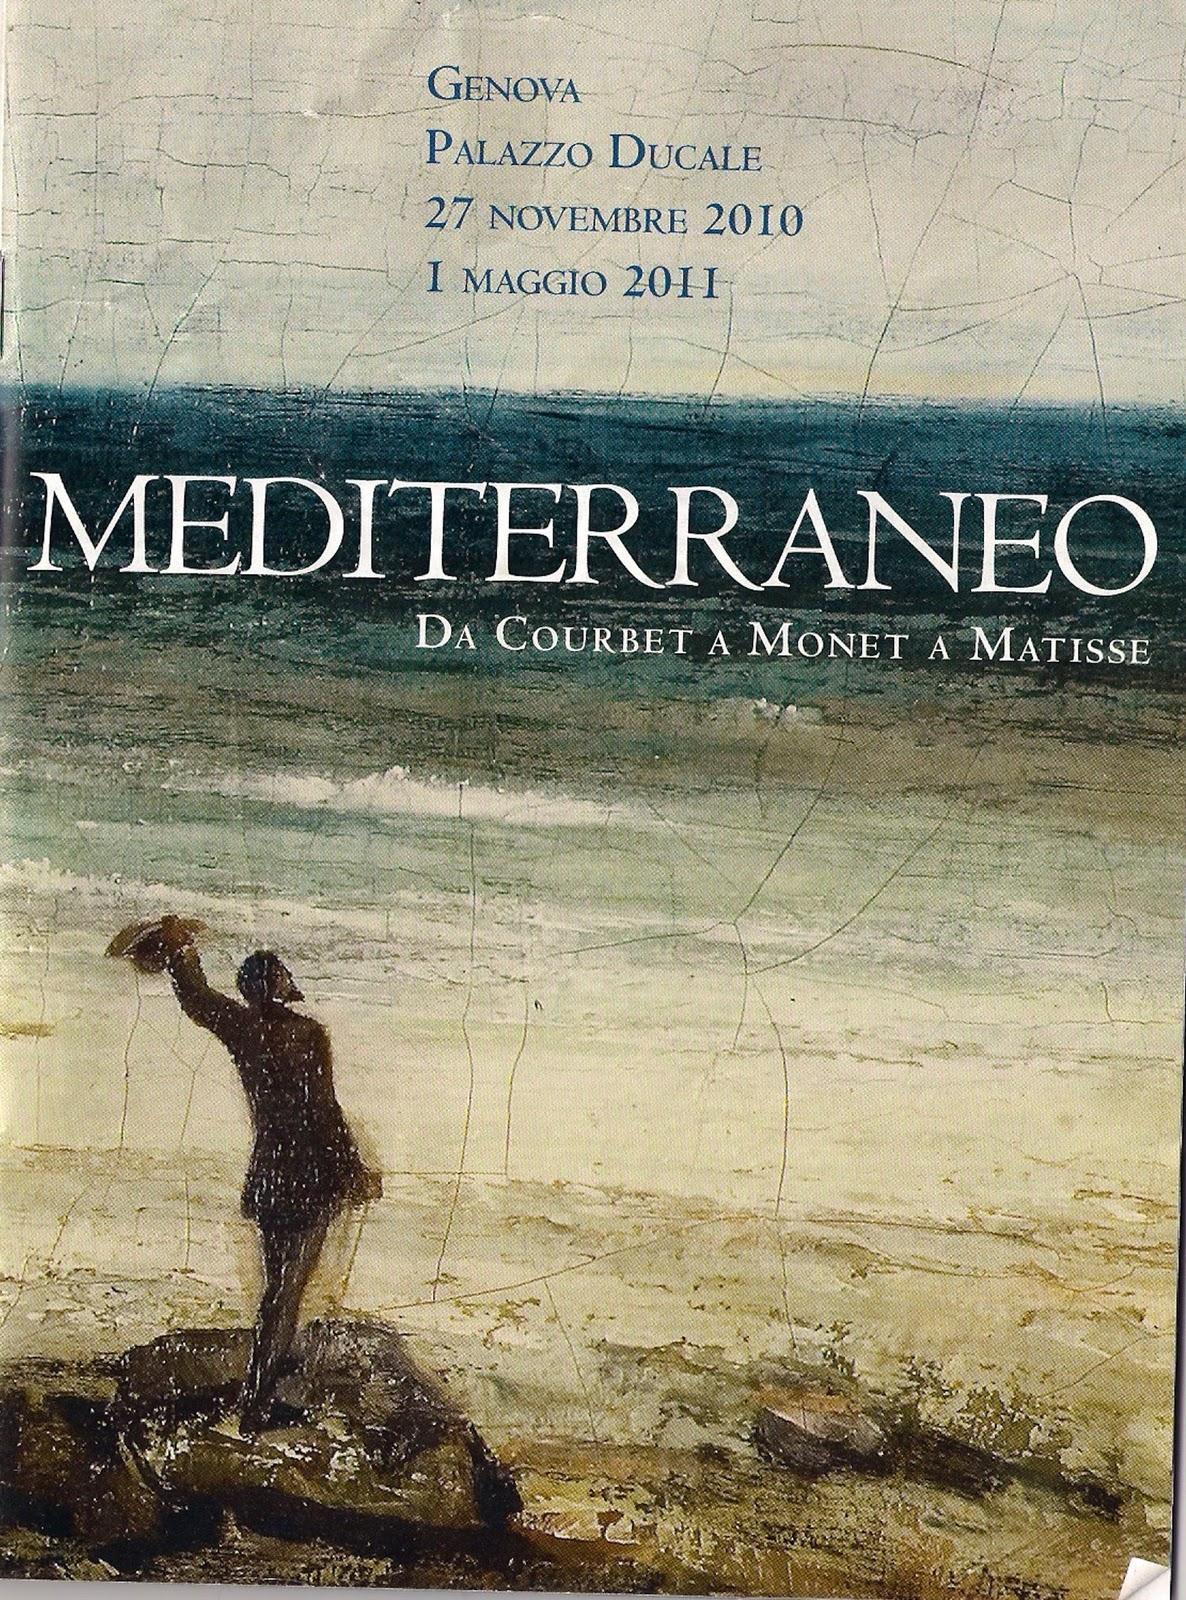 La cantina di mery mediterraneo da courbet a monet a matisse for Da matisse a monet